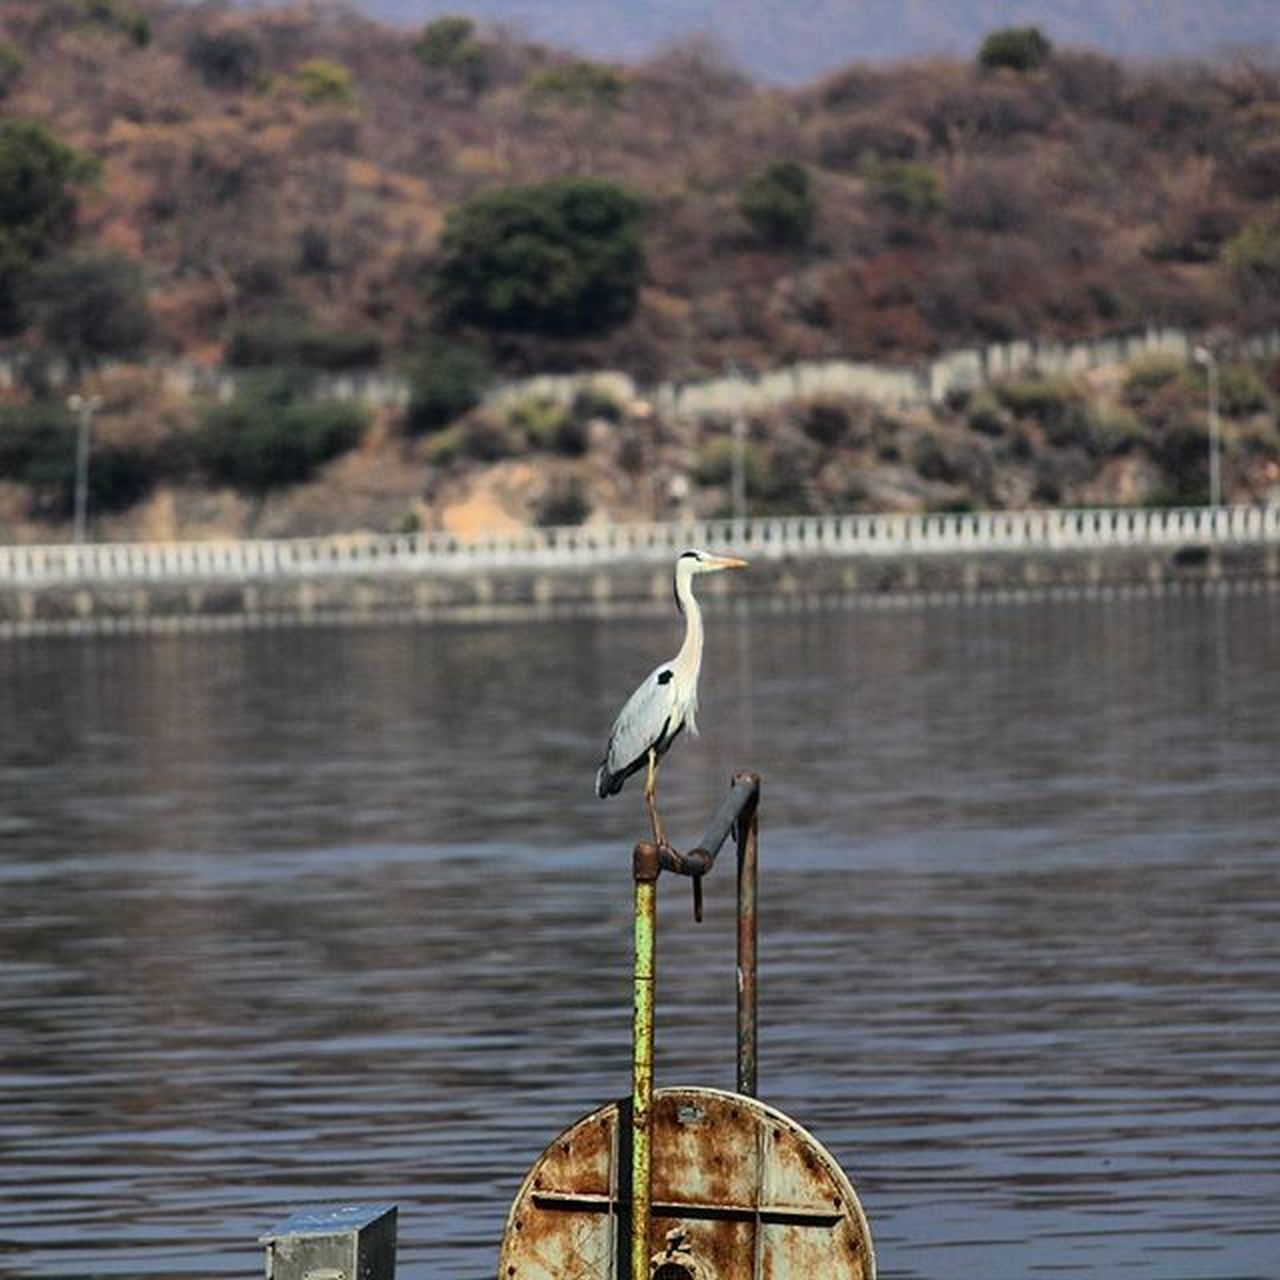 Can any1 tell me which bird is it ?? UNKNOWN BIRD || CANON 700D || 55-250MM LENS || MORNING SHOT Brid Birdstagram Picoftheday Instaexplorer Wanderer Clicks Ig_gram Ig_officials Instagram Bird_on_Instagram LongShots Wintermornings CaptureBirdie Oye_my_click Morningclicks Igers_wanderlust BestNatureShotz Exclusiveshotz Bestshotz Myshot Iiclicks_India Iiclicks_udaipur True_photo_lover Udaipuritids UdaipurBlogs InstaUdaipur SweetUdaipur UnseenUdaipur Udaipurlakecity